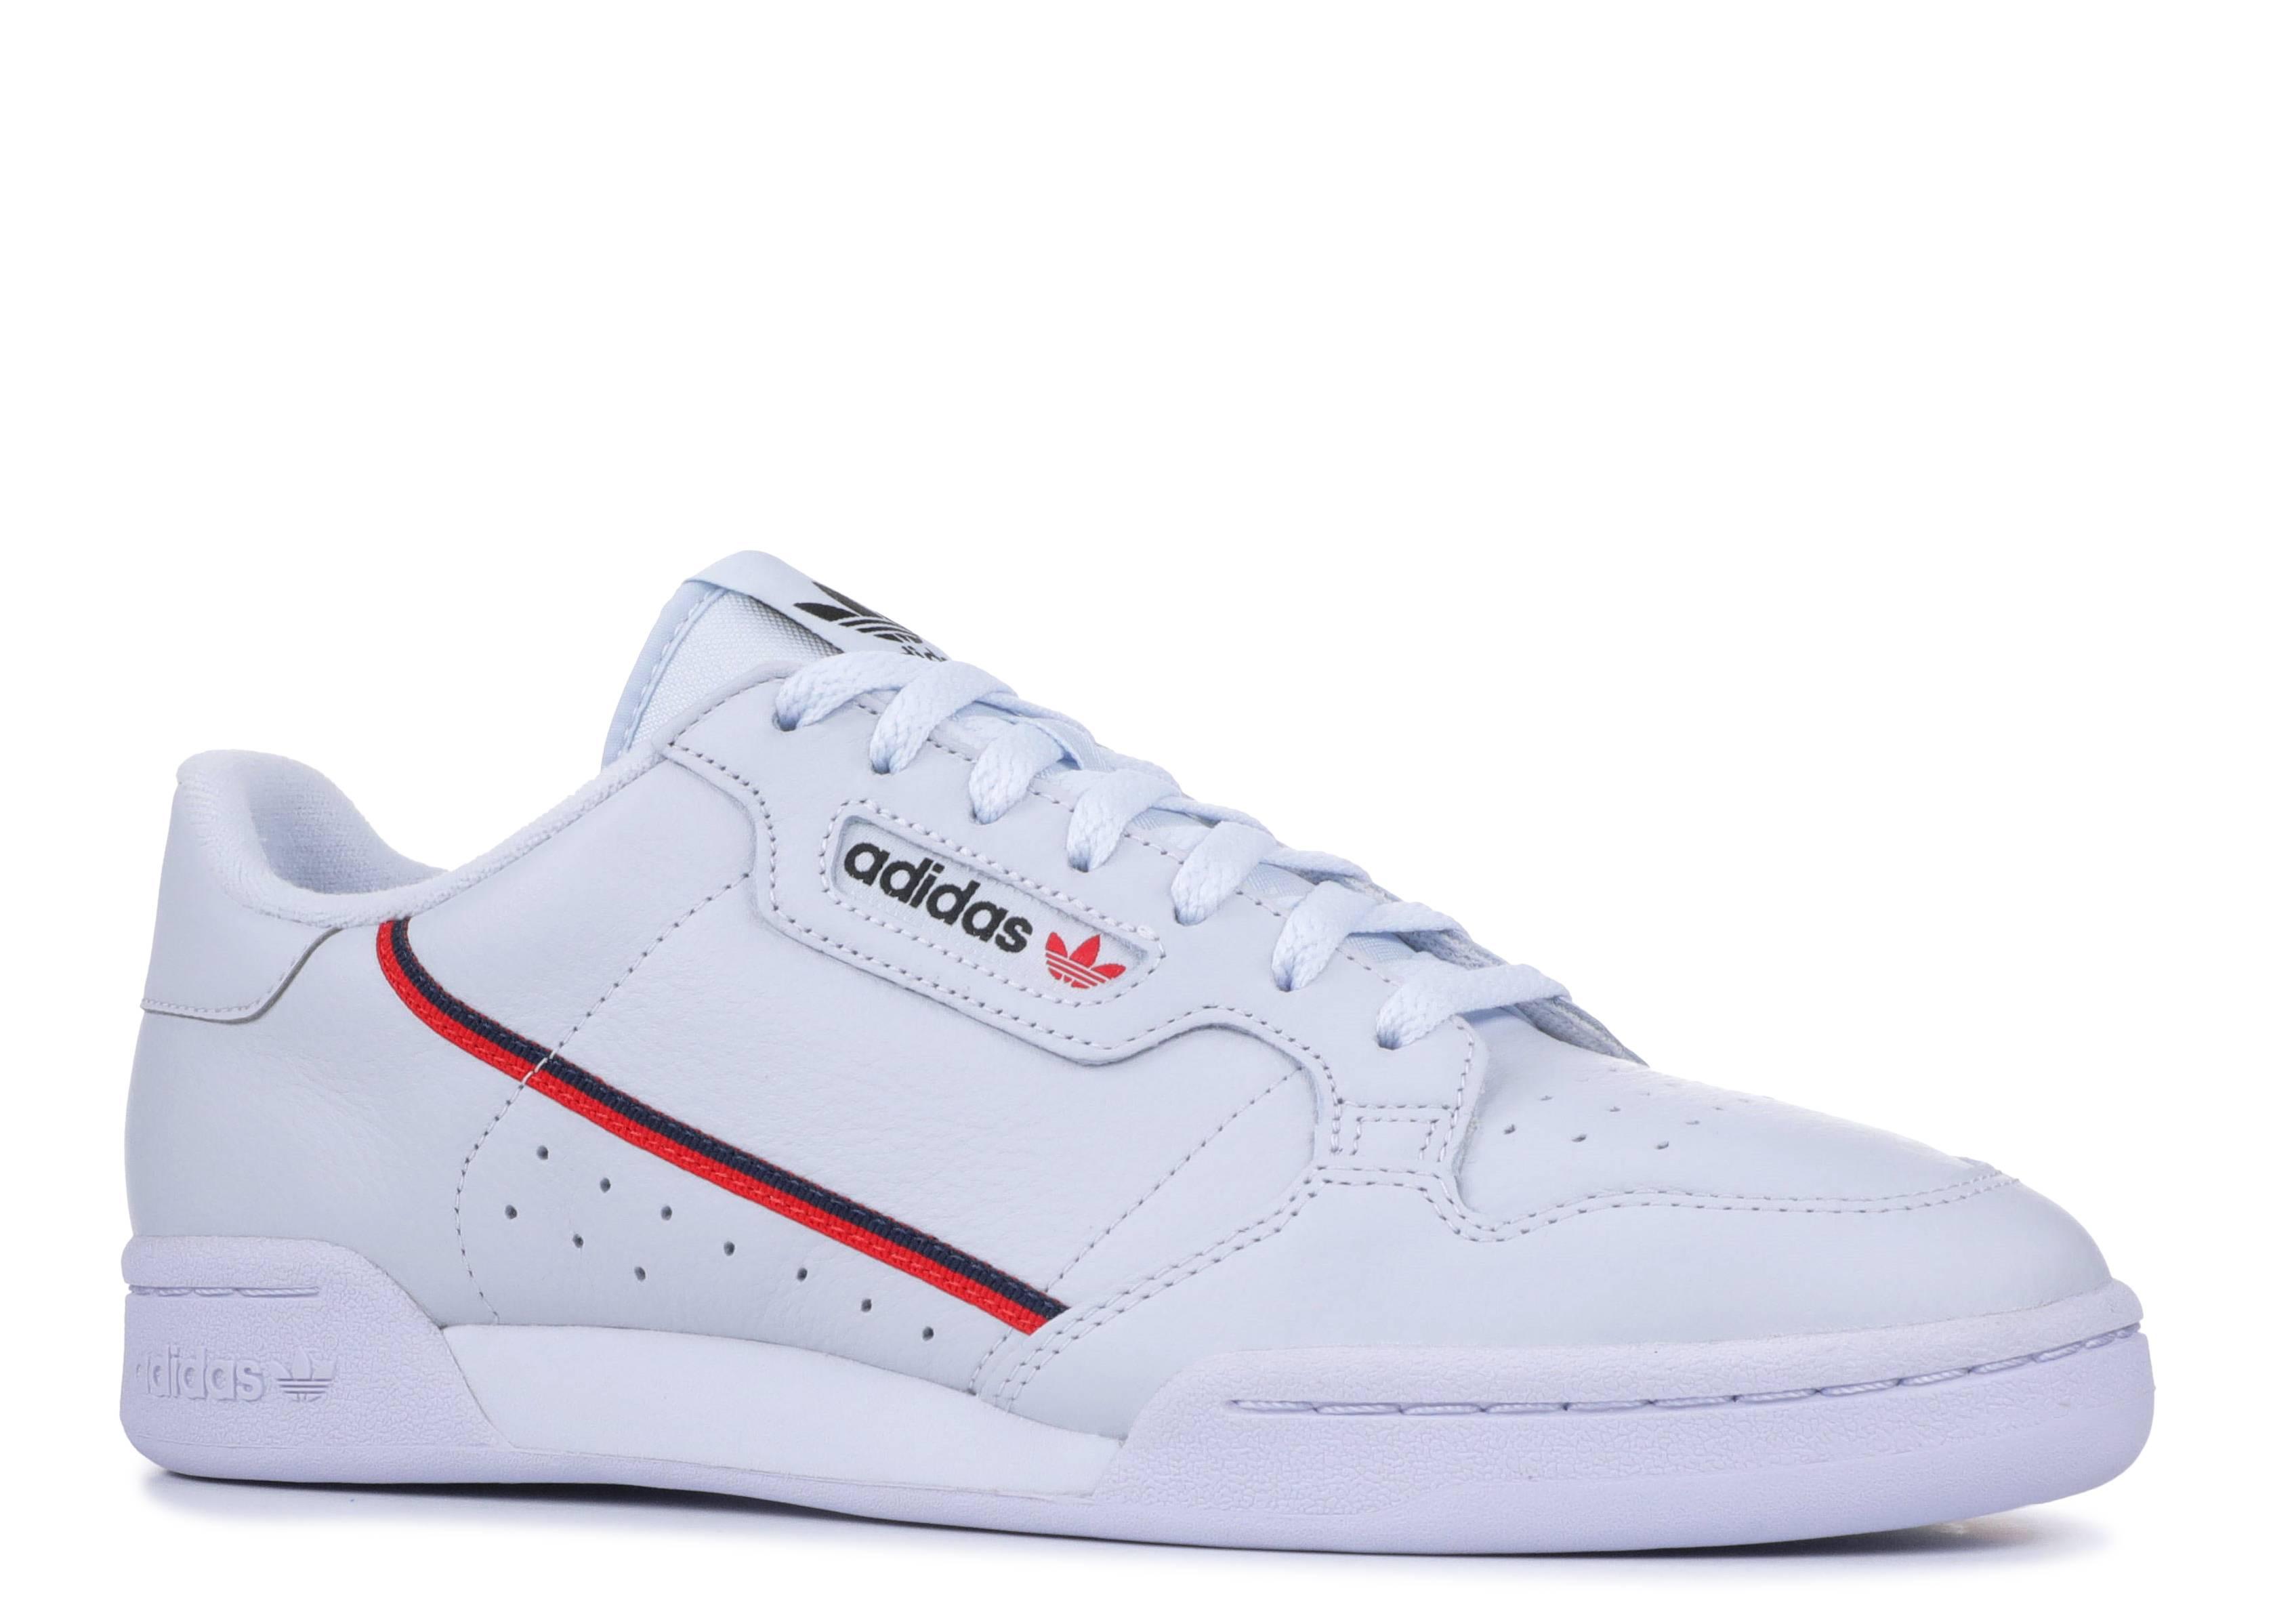 15c9c5d779c930 Continental 80 - Adidas - b41673 - aerblue scarle conavu